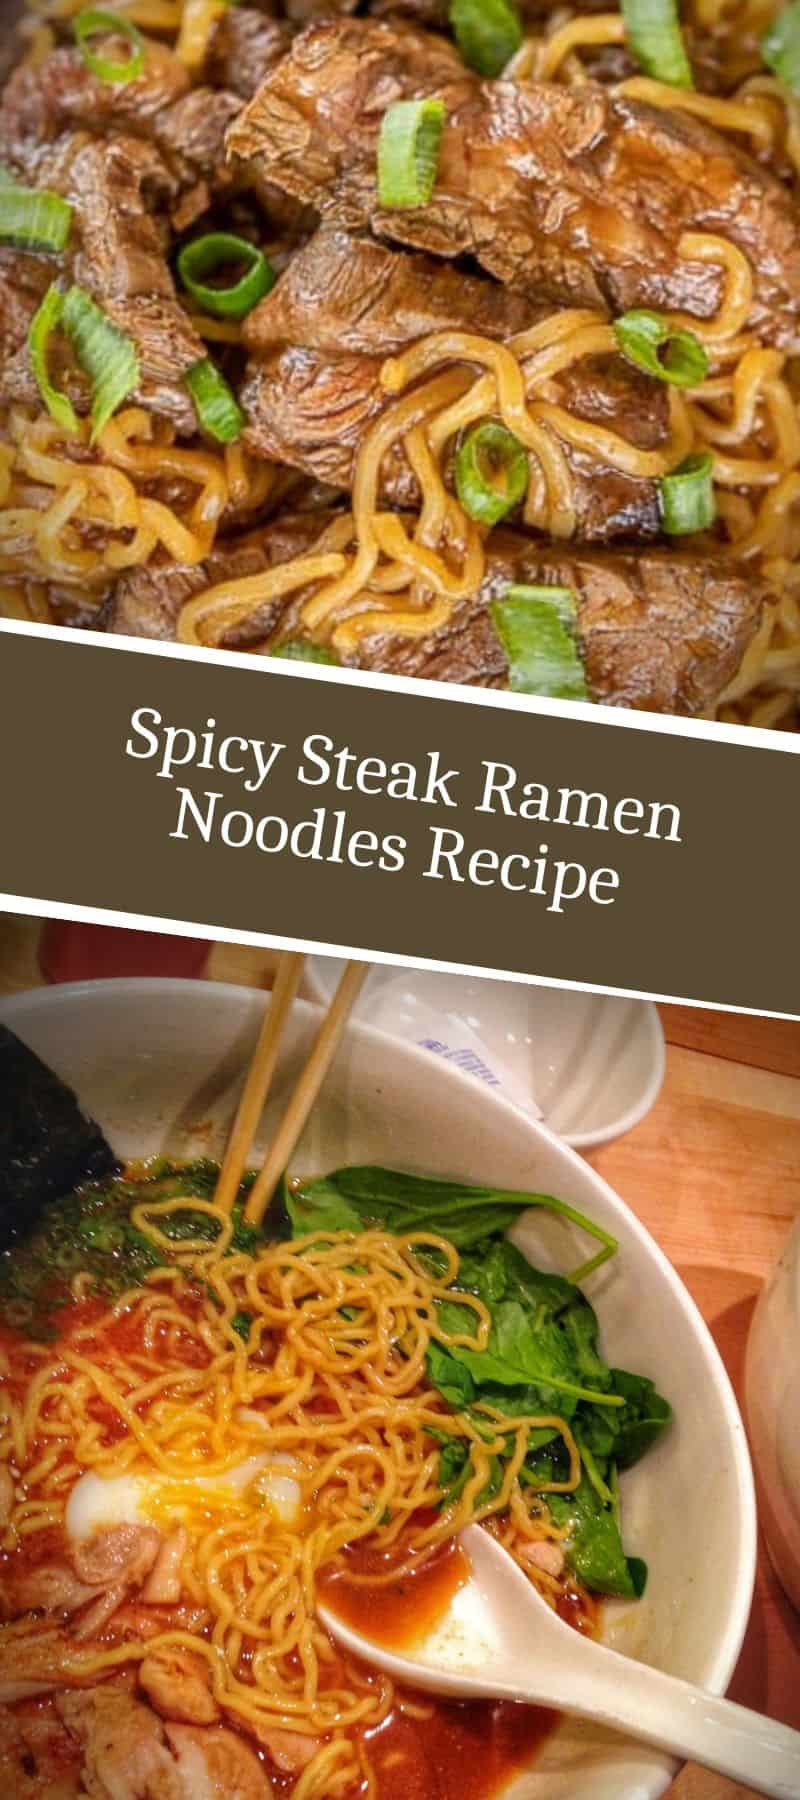 Spicy Steak Ramen Noodles Recipe 3